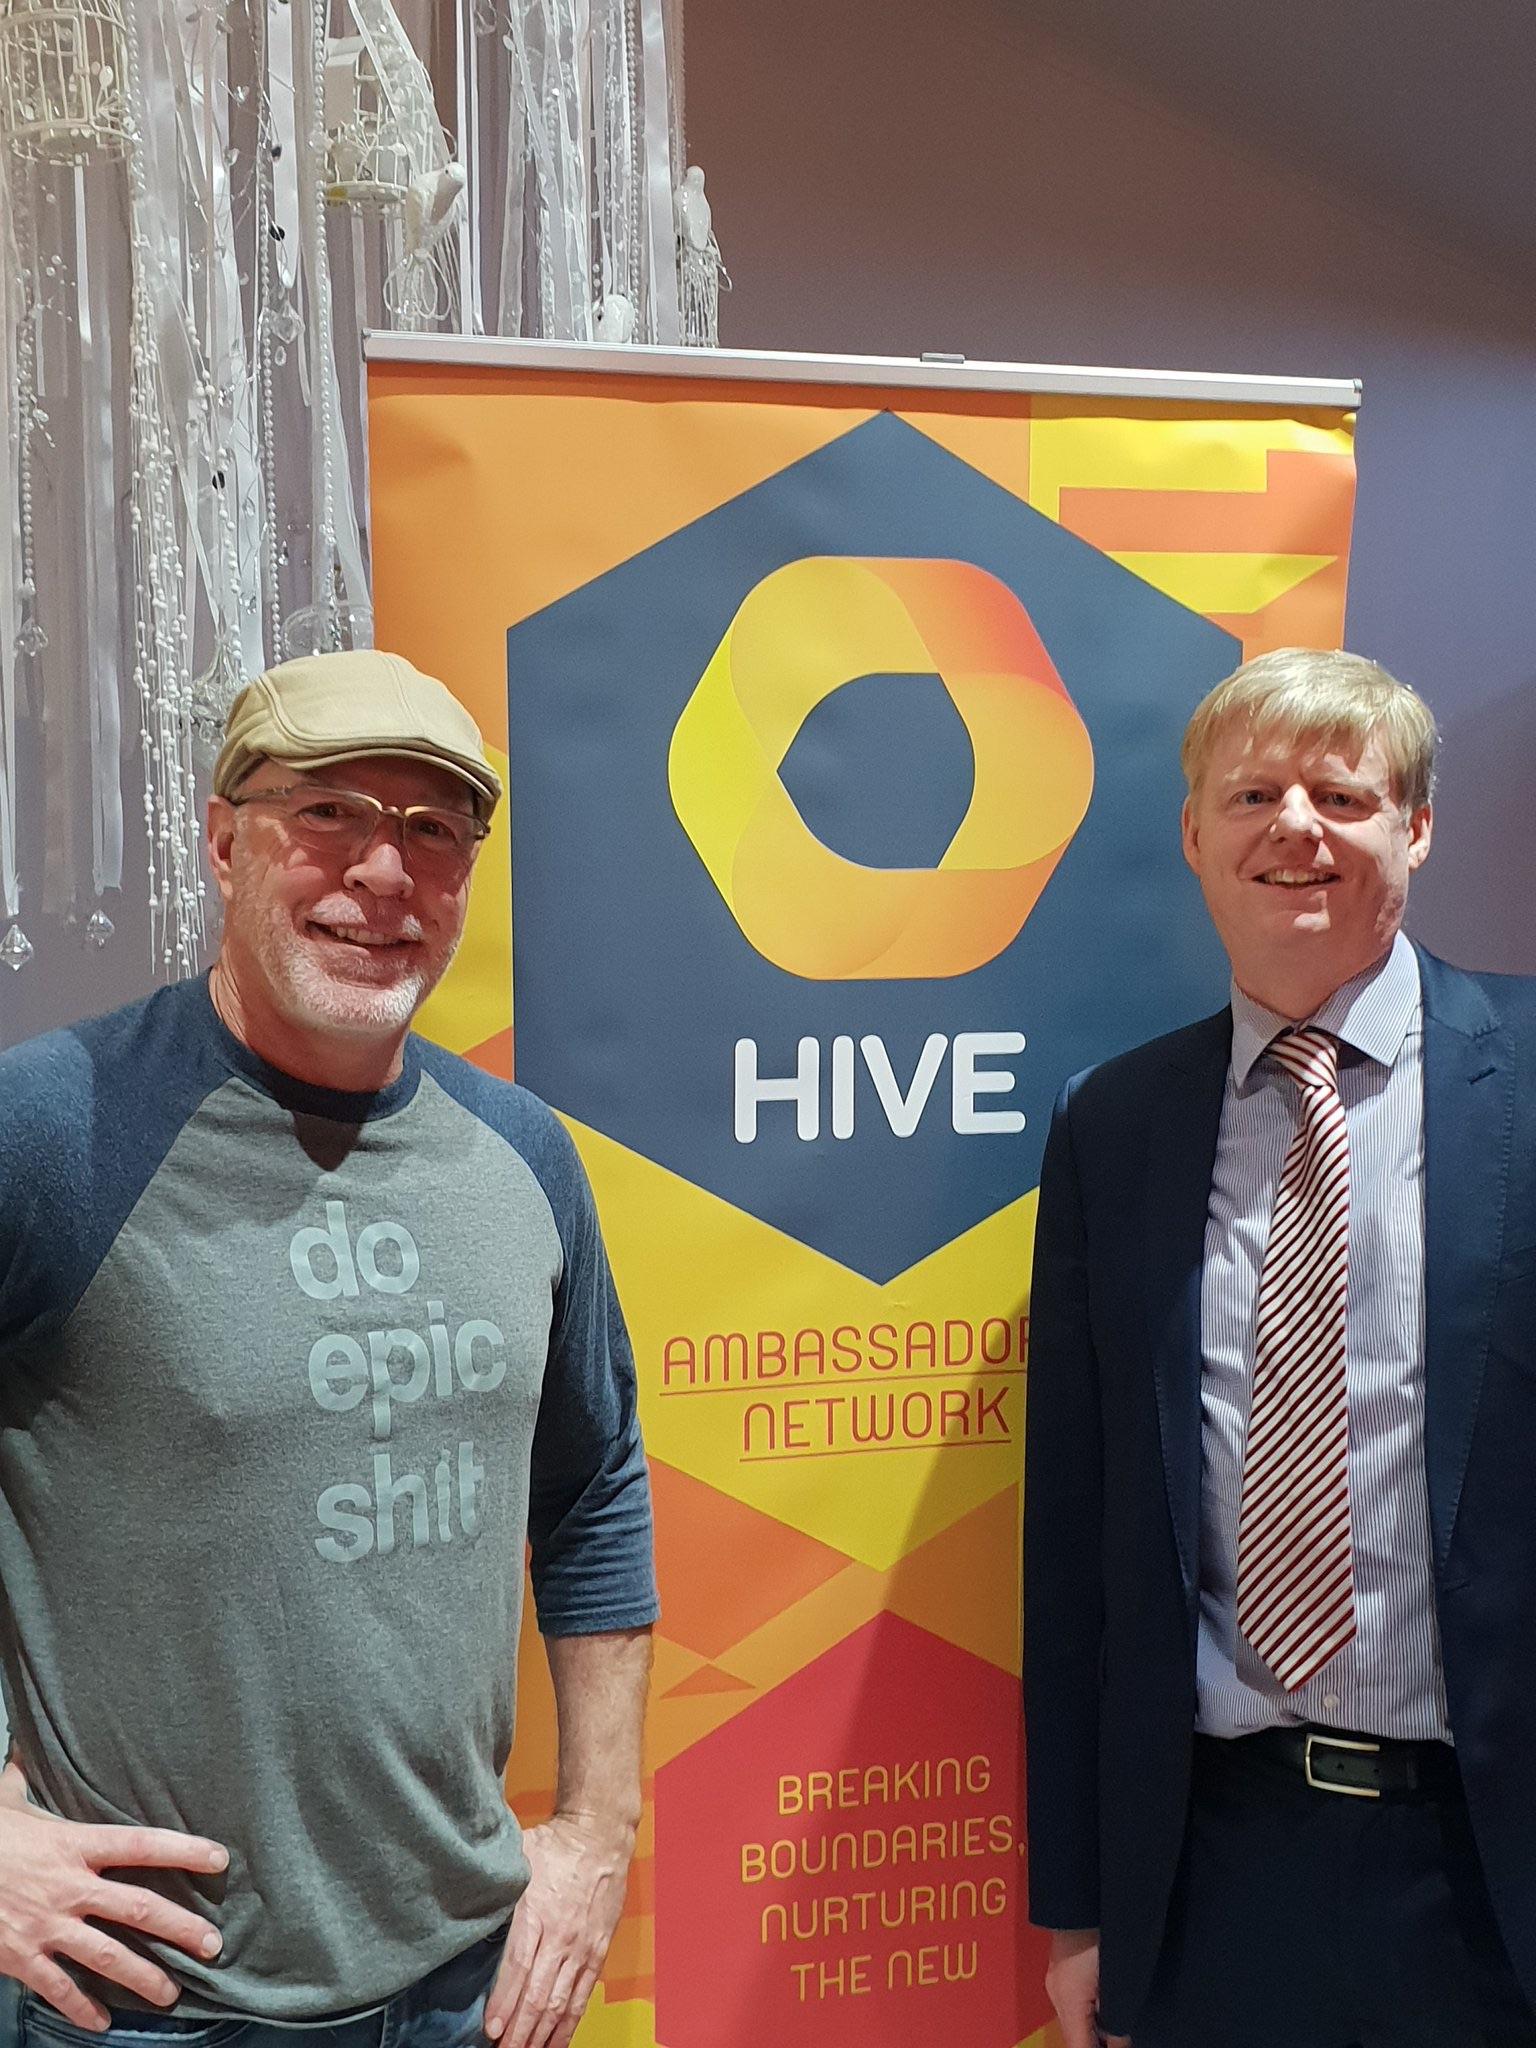 Digital Event Success thanks to Blackburn Hive Network